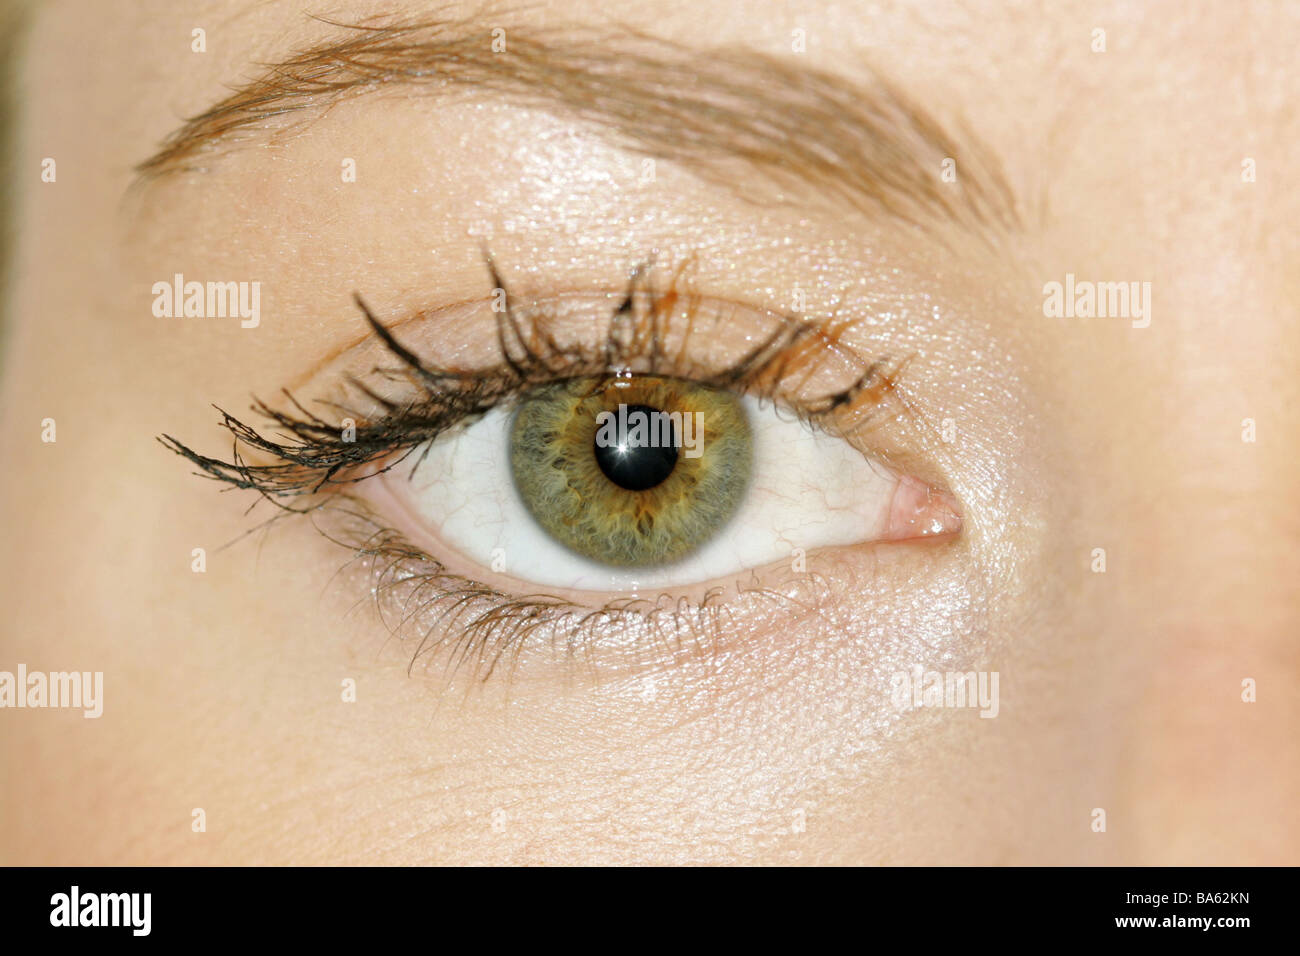 Woman young eye close-up face Sinnesorgan perception gaze camera ...